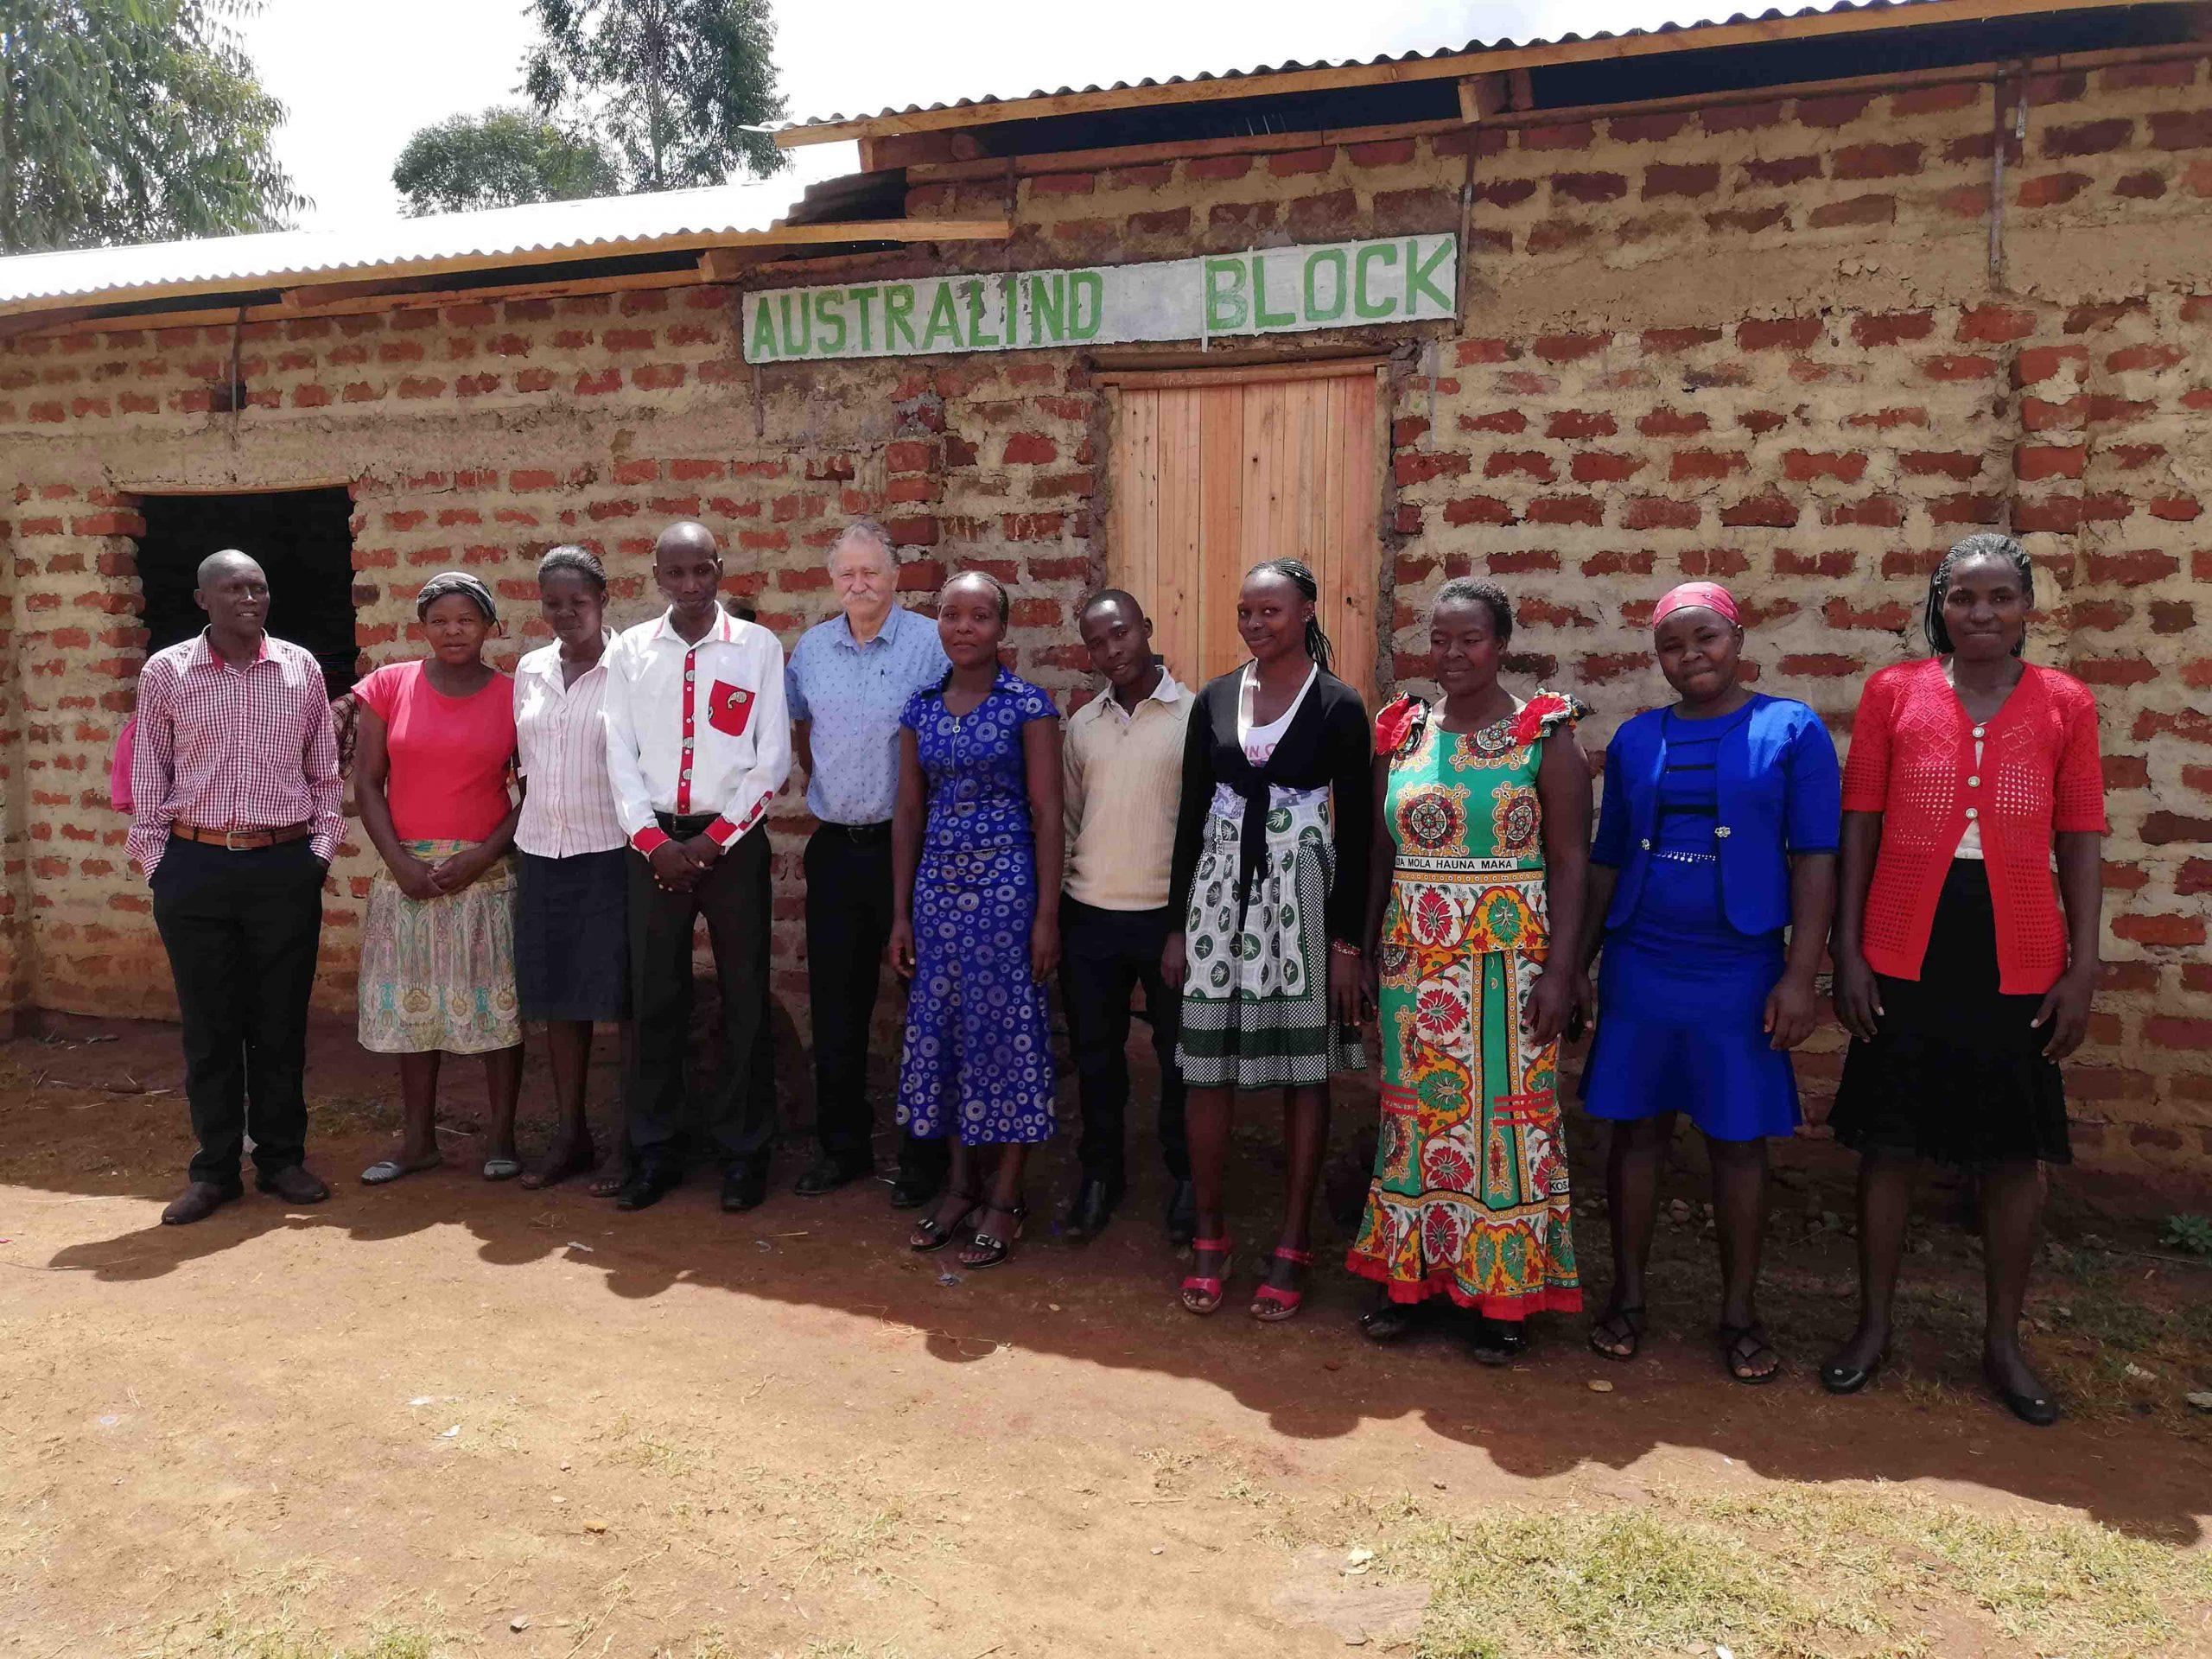 Pastor Richard Foster from Christian Reformed Church of Australind Holds Seminar